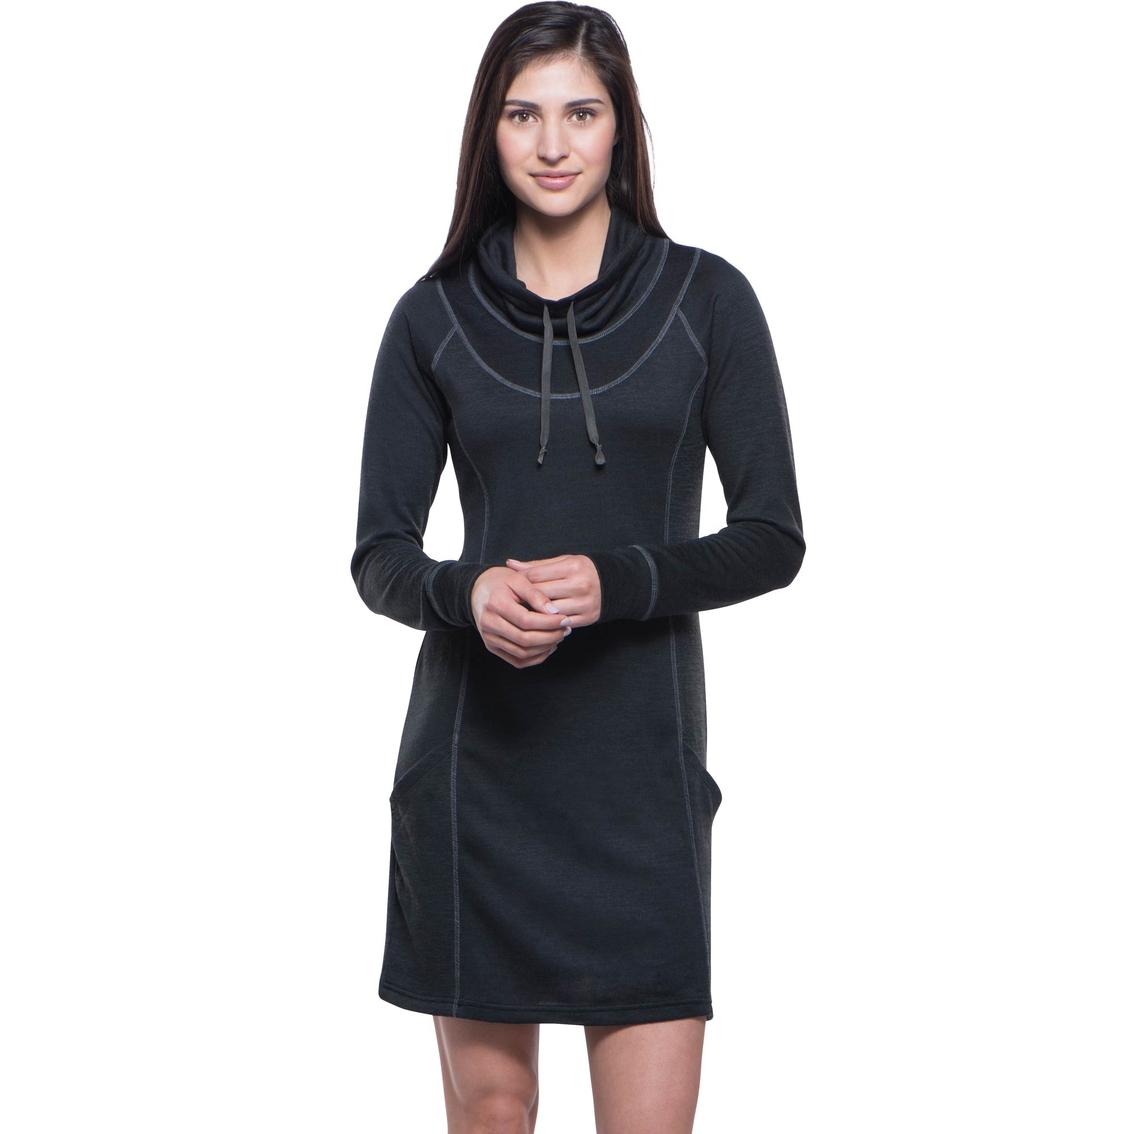 Kuhl Lea Dress